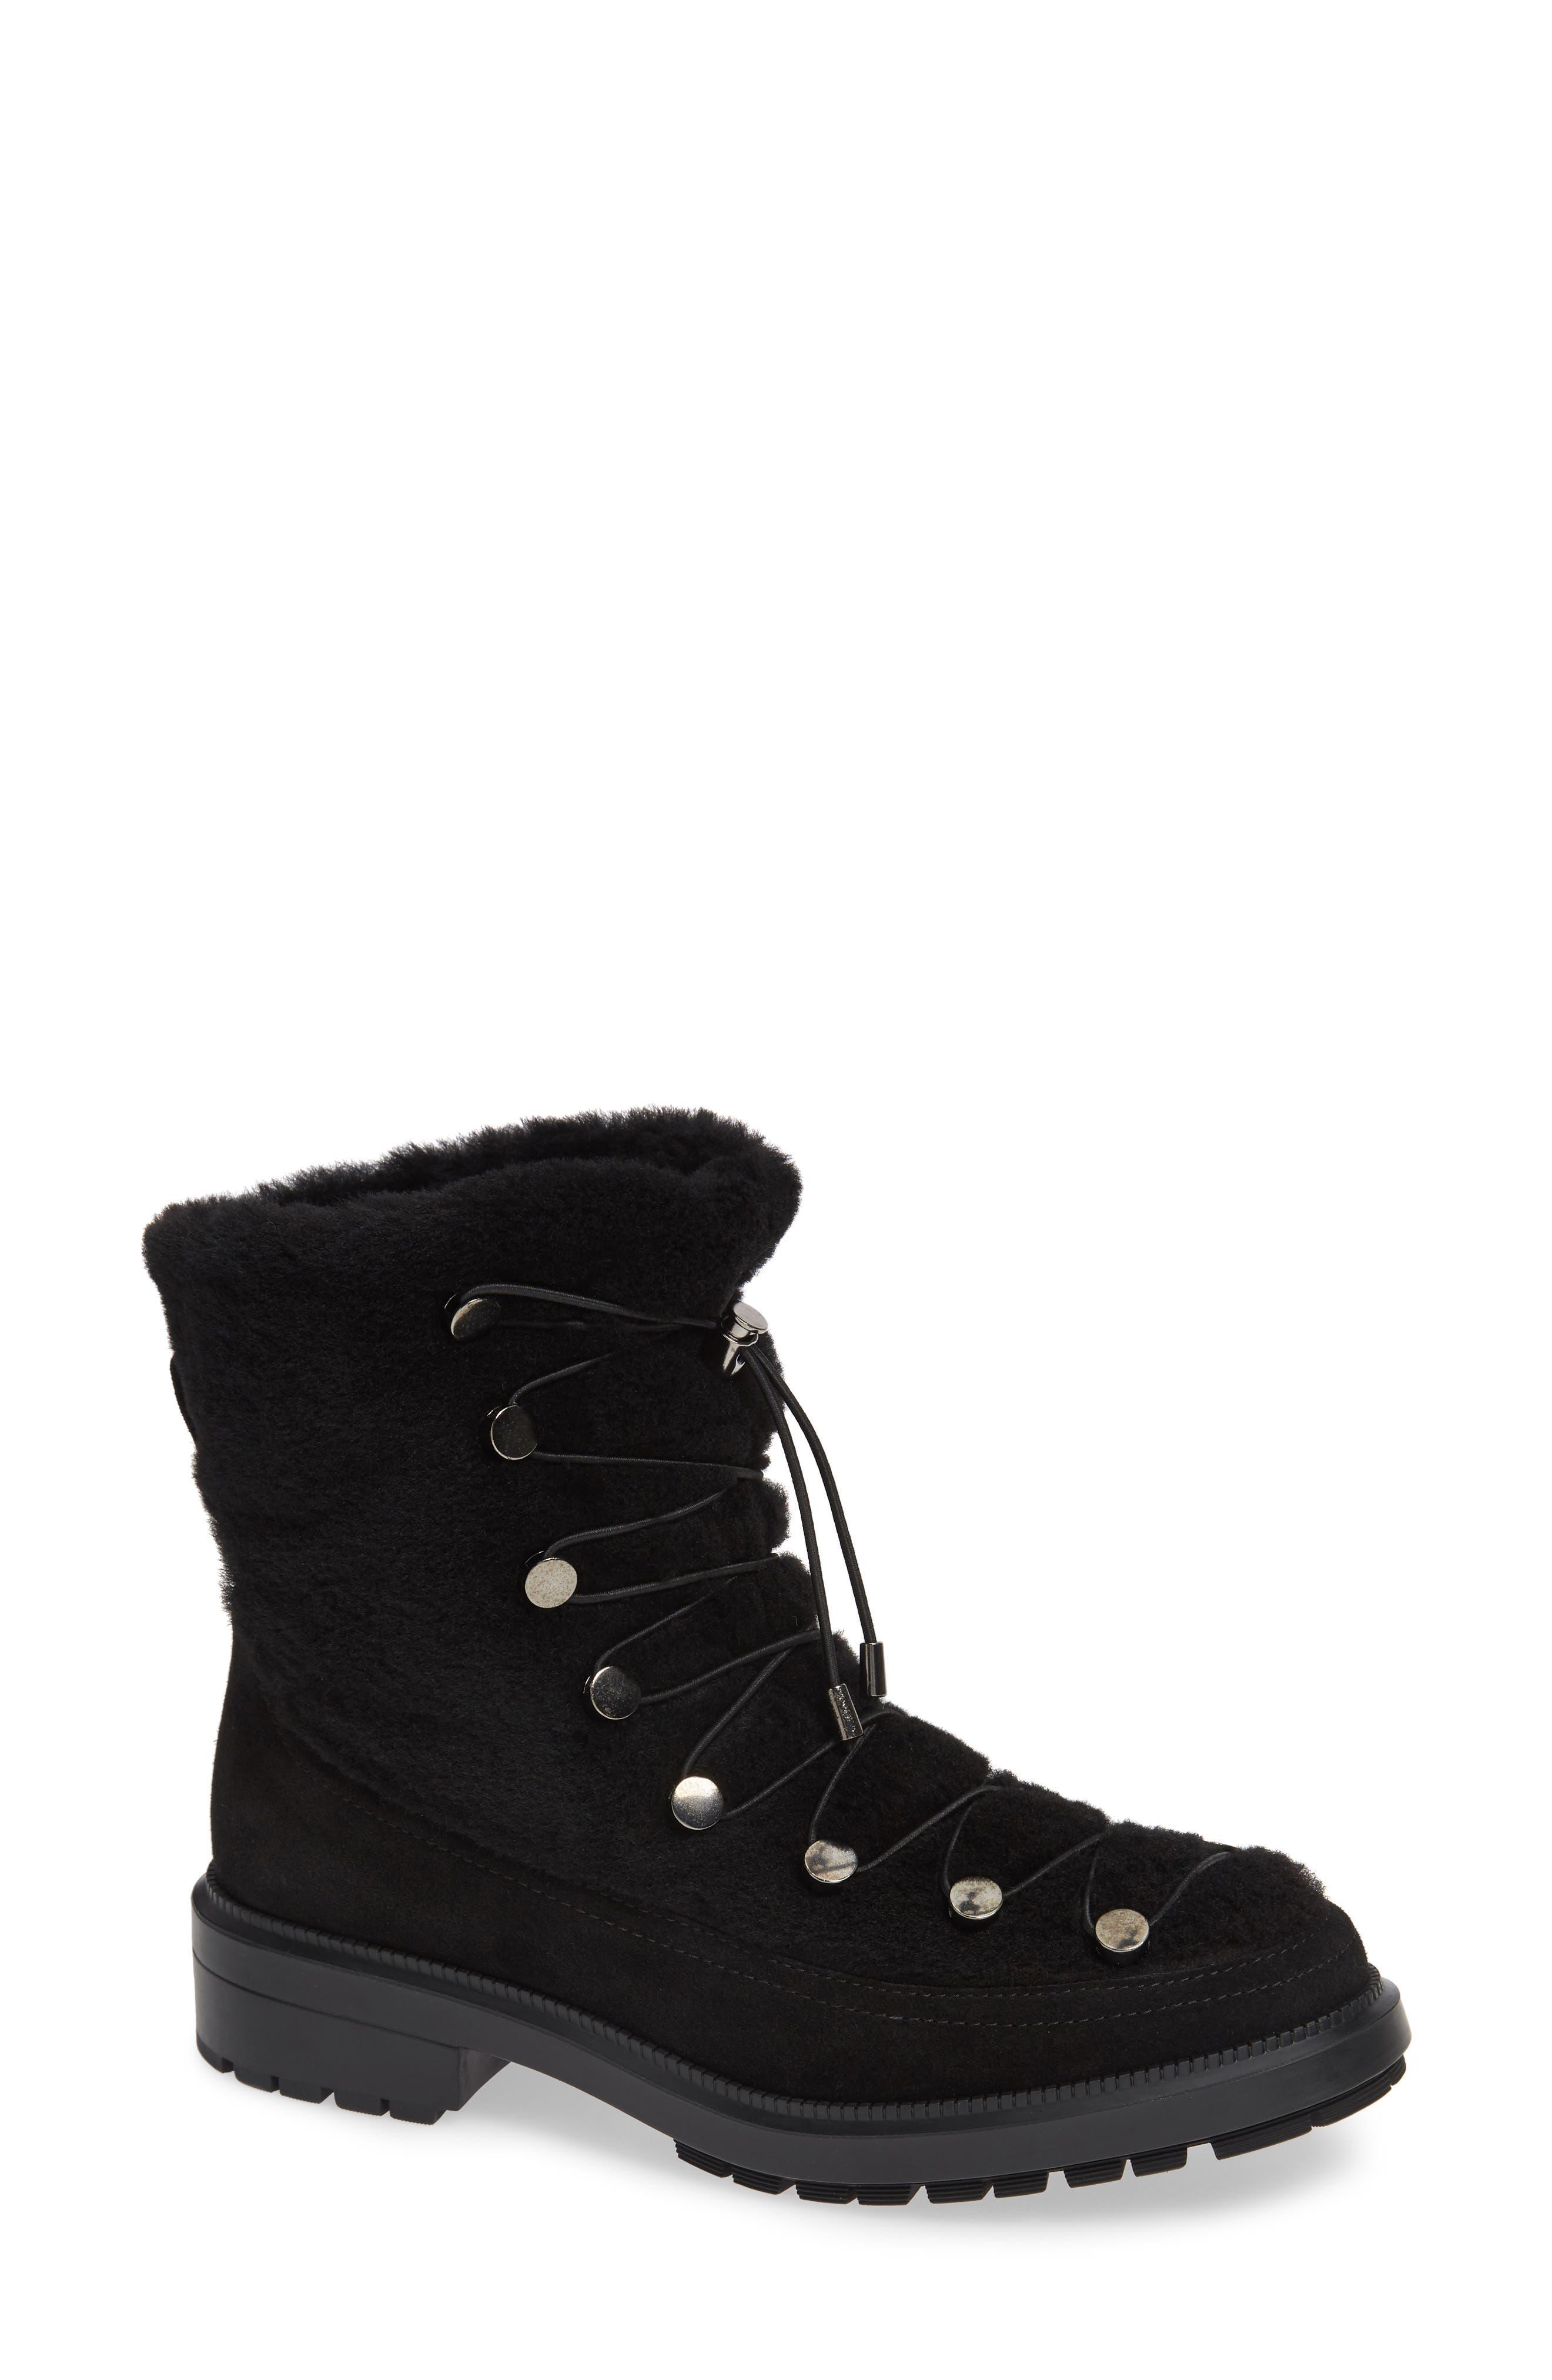 Aquatalia Lorena Genuine Shearling Boot, Black